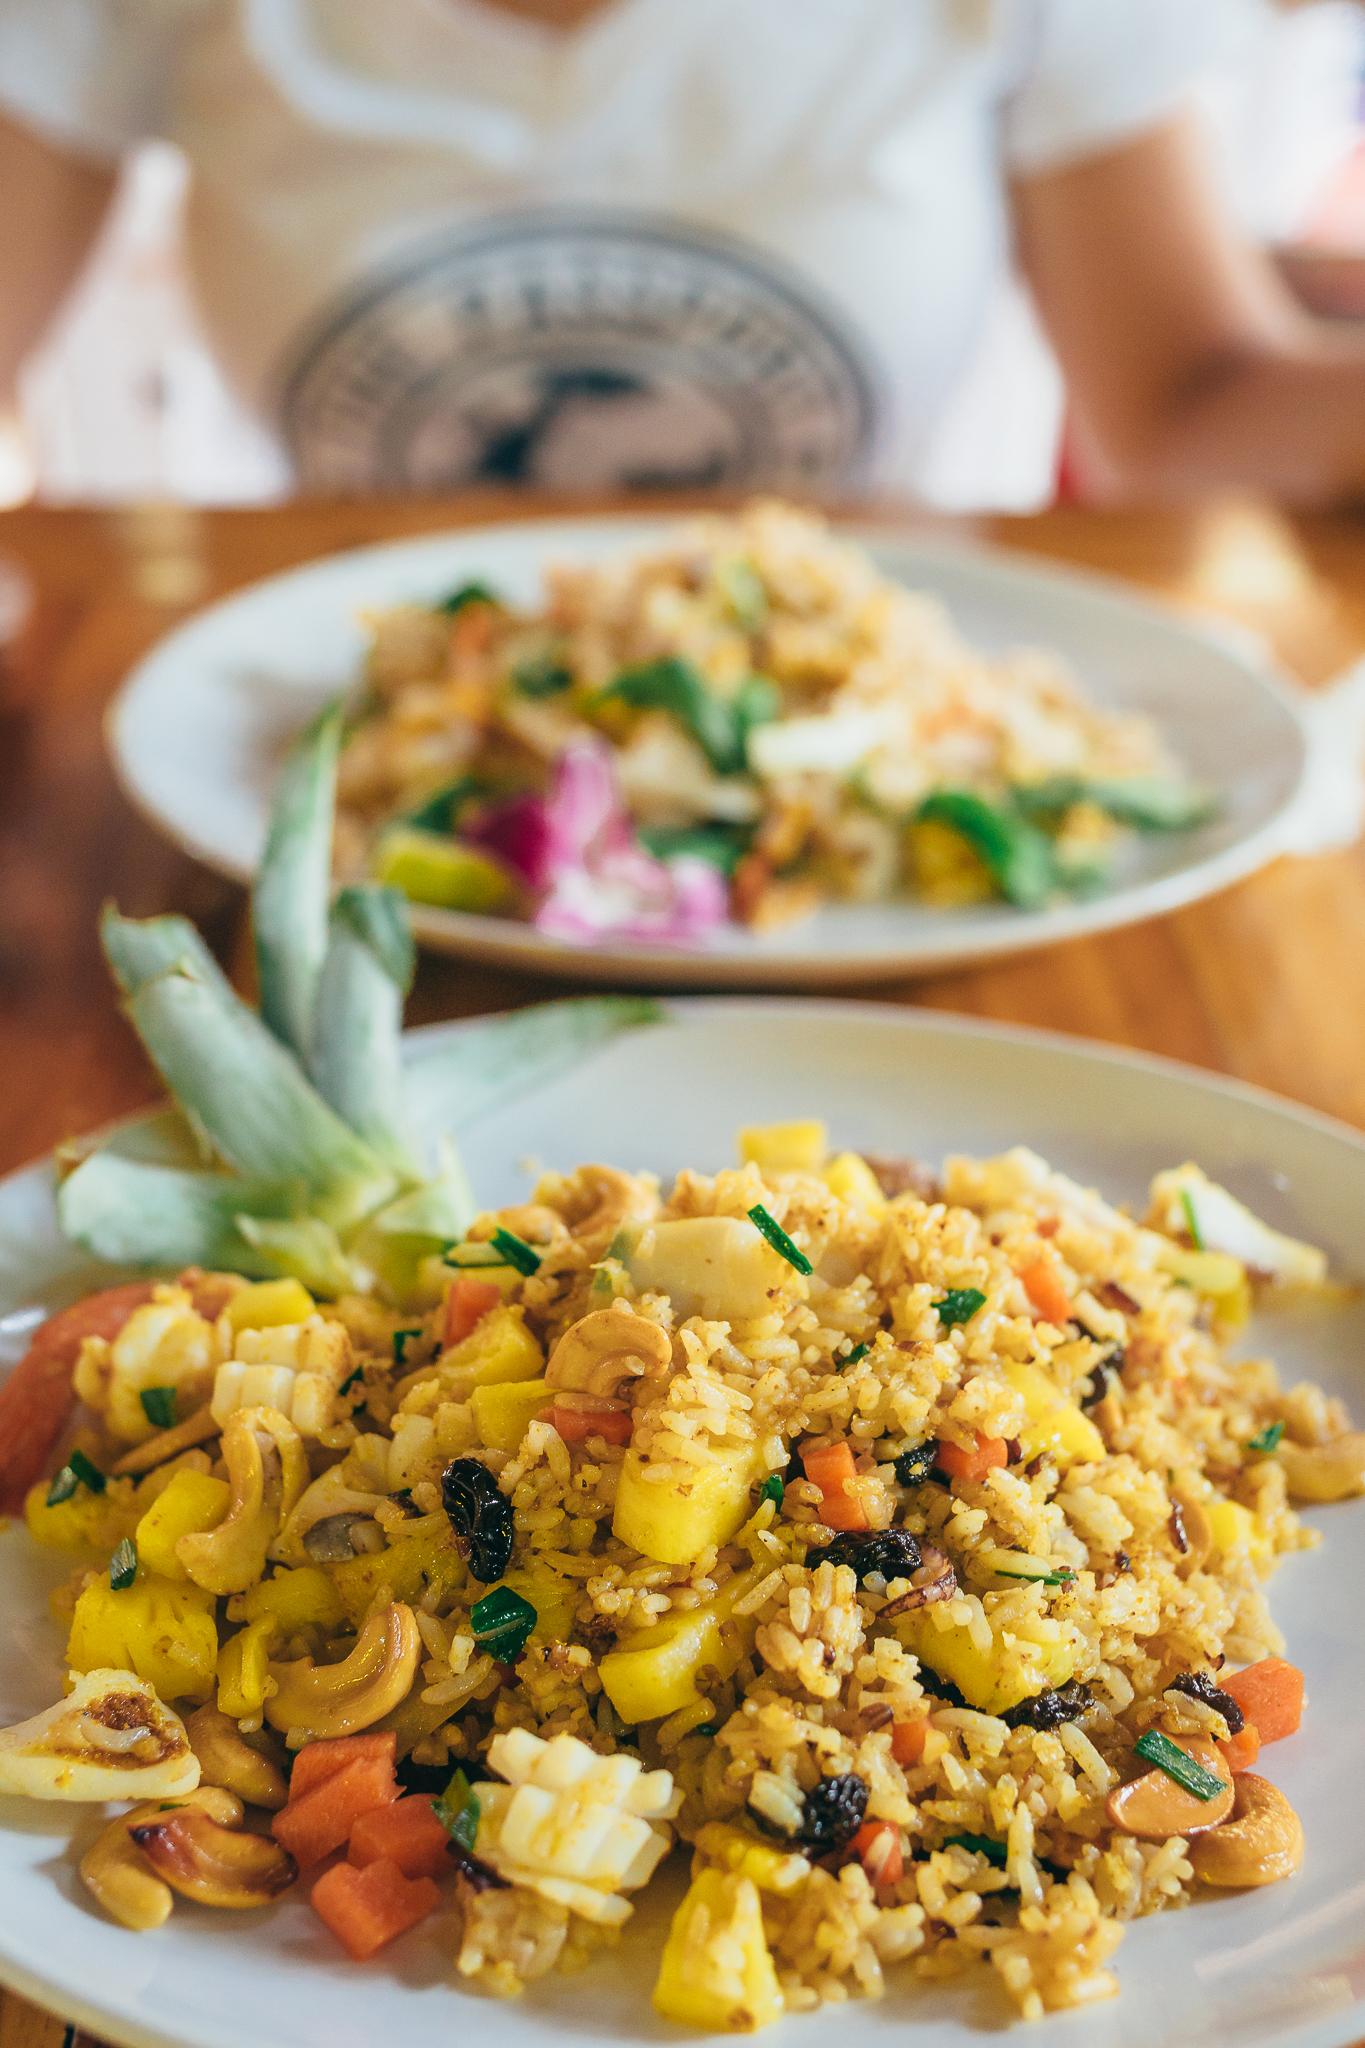 Pinneaple fried rice